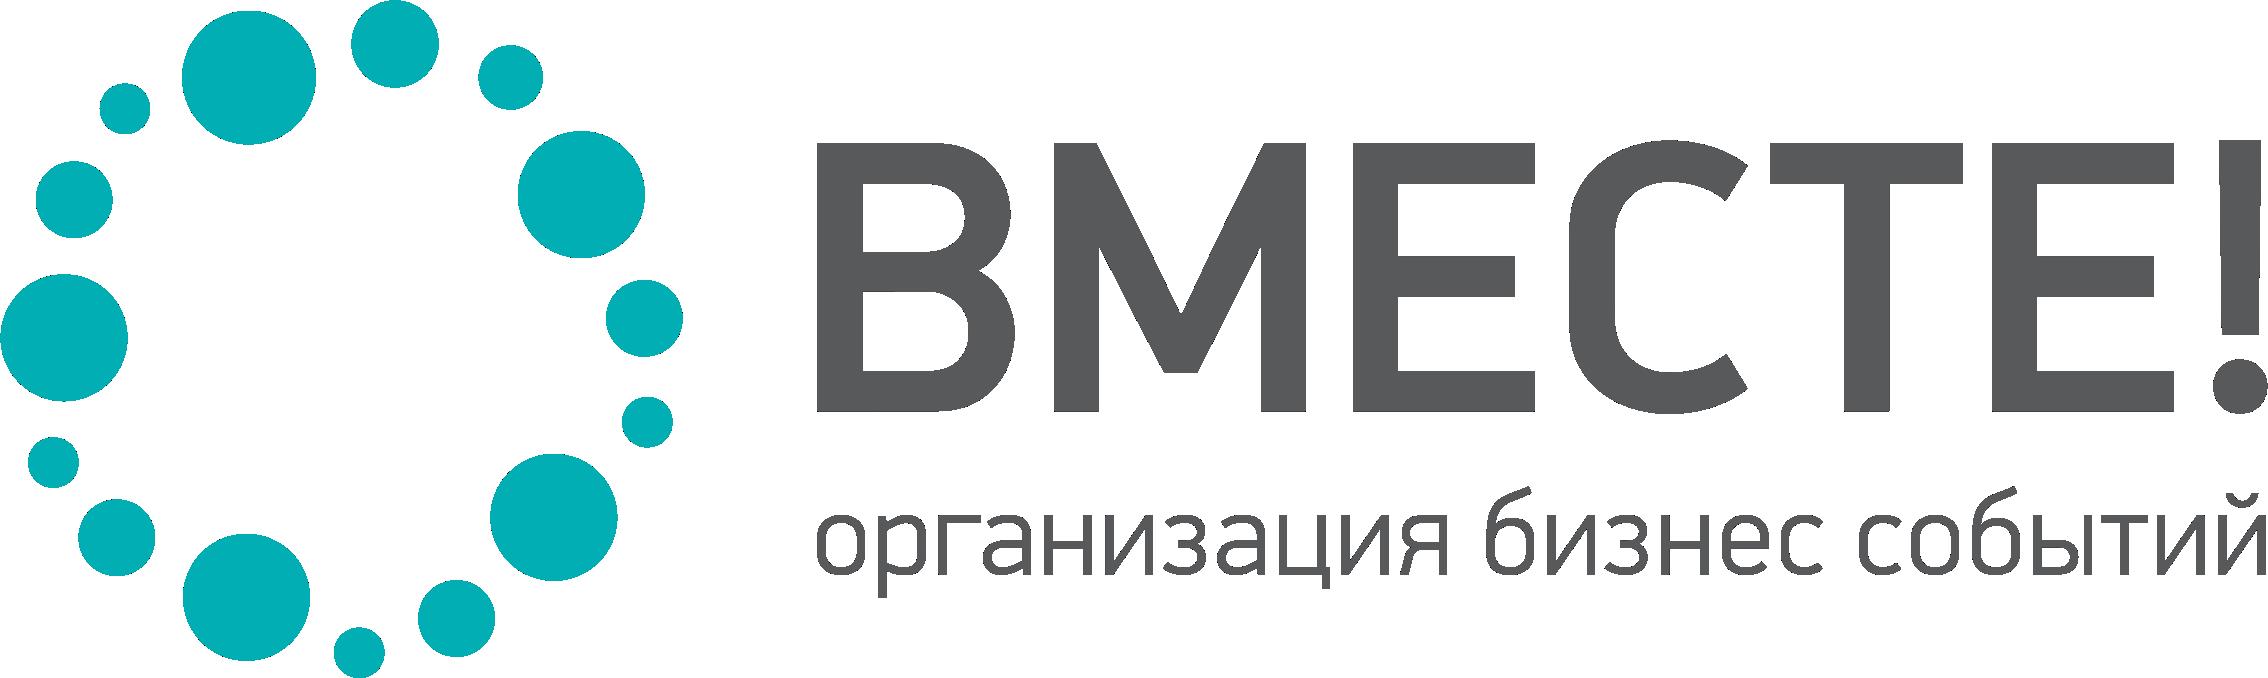 ВМЕСТЕ — организация бизнес событий